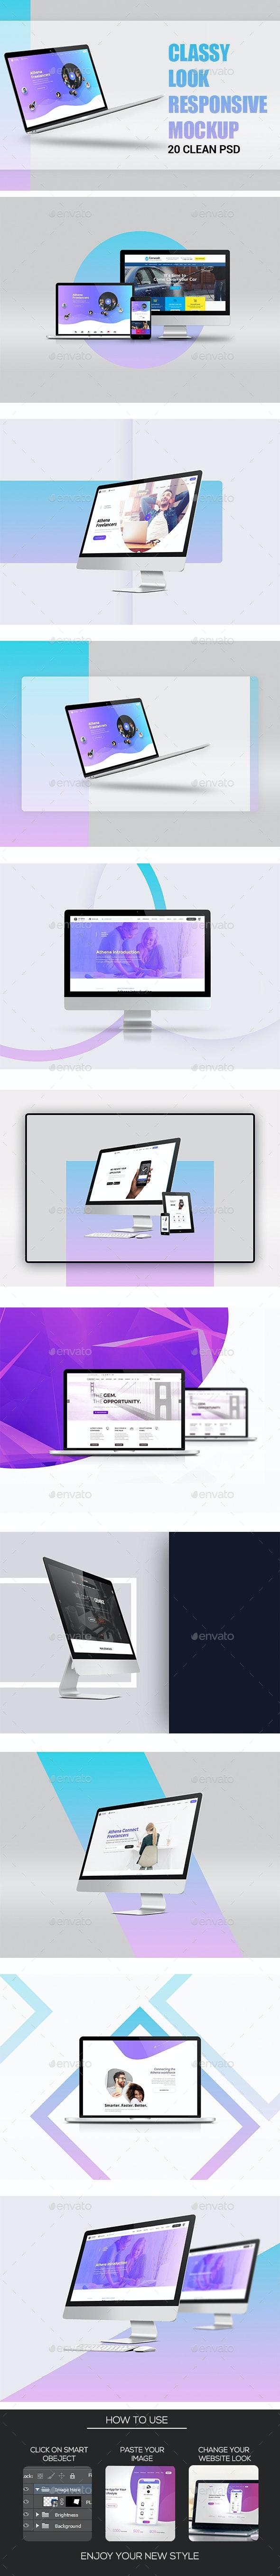 Realistic Laptop Mockup - Displays Product Mock-Ups